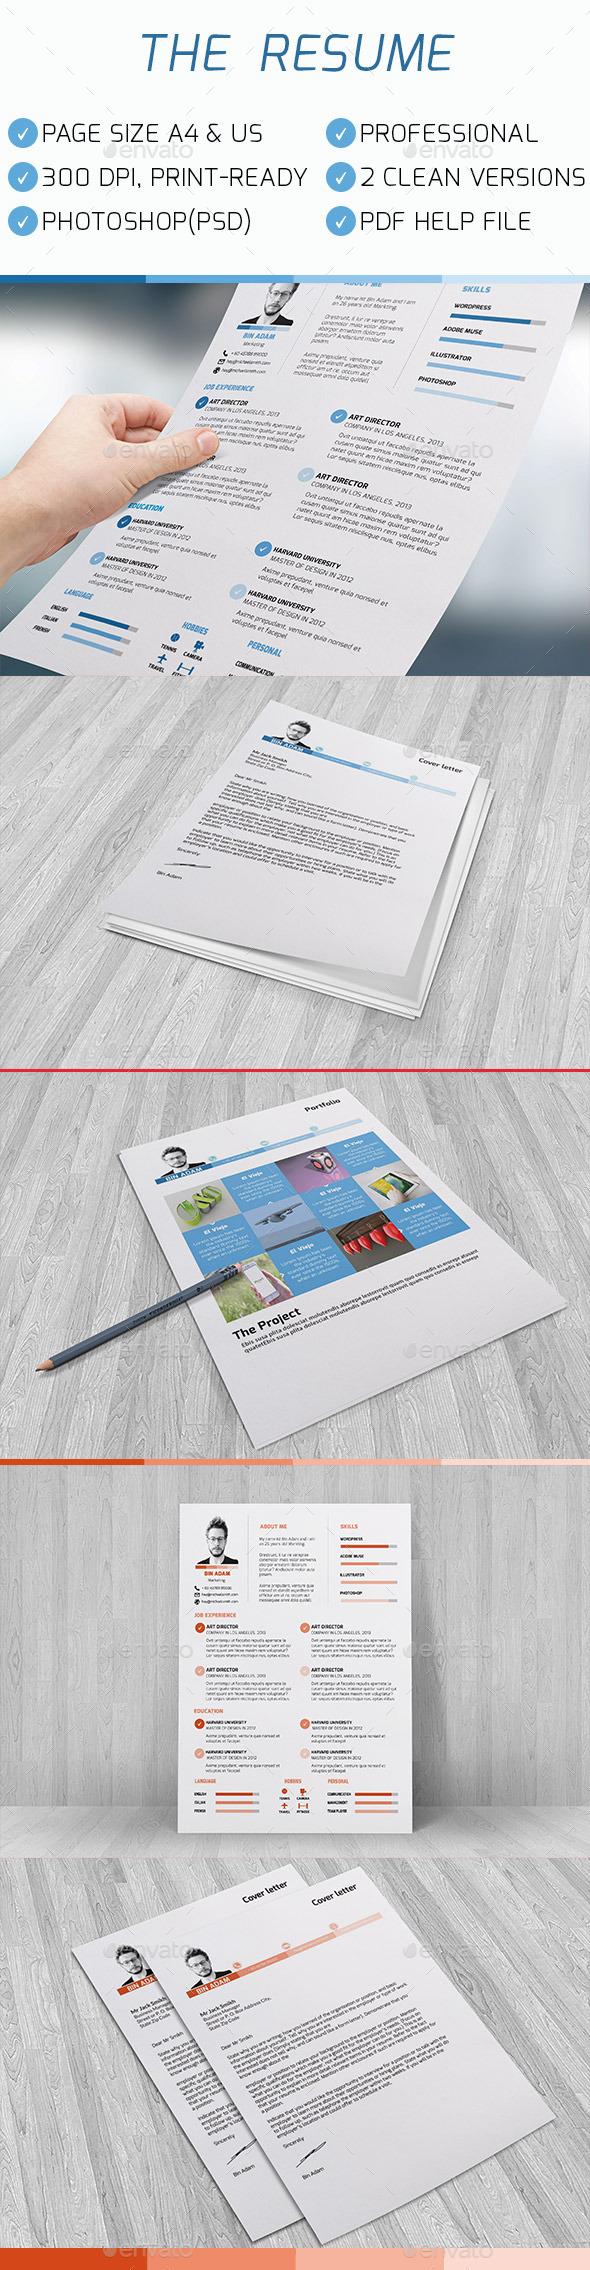 GraphicRiver The Resume 10693976